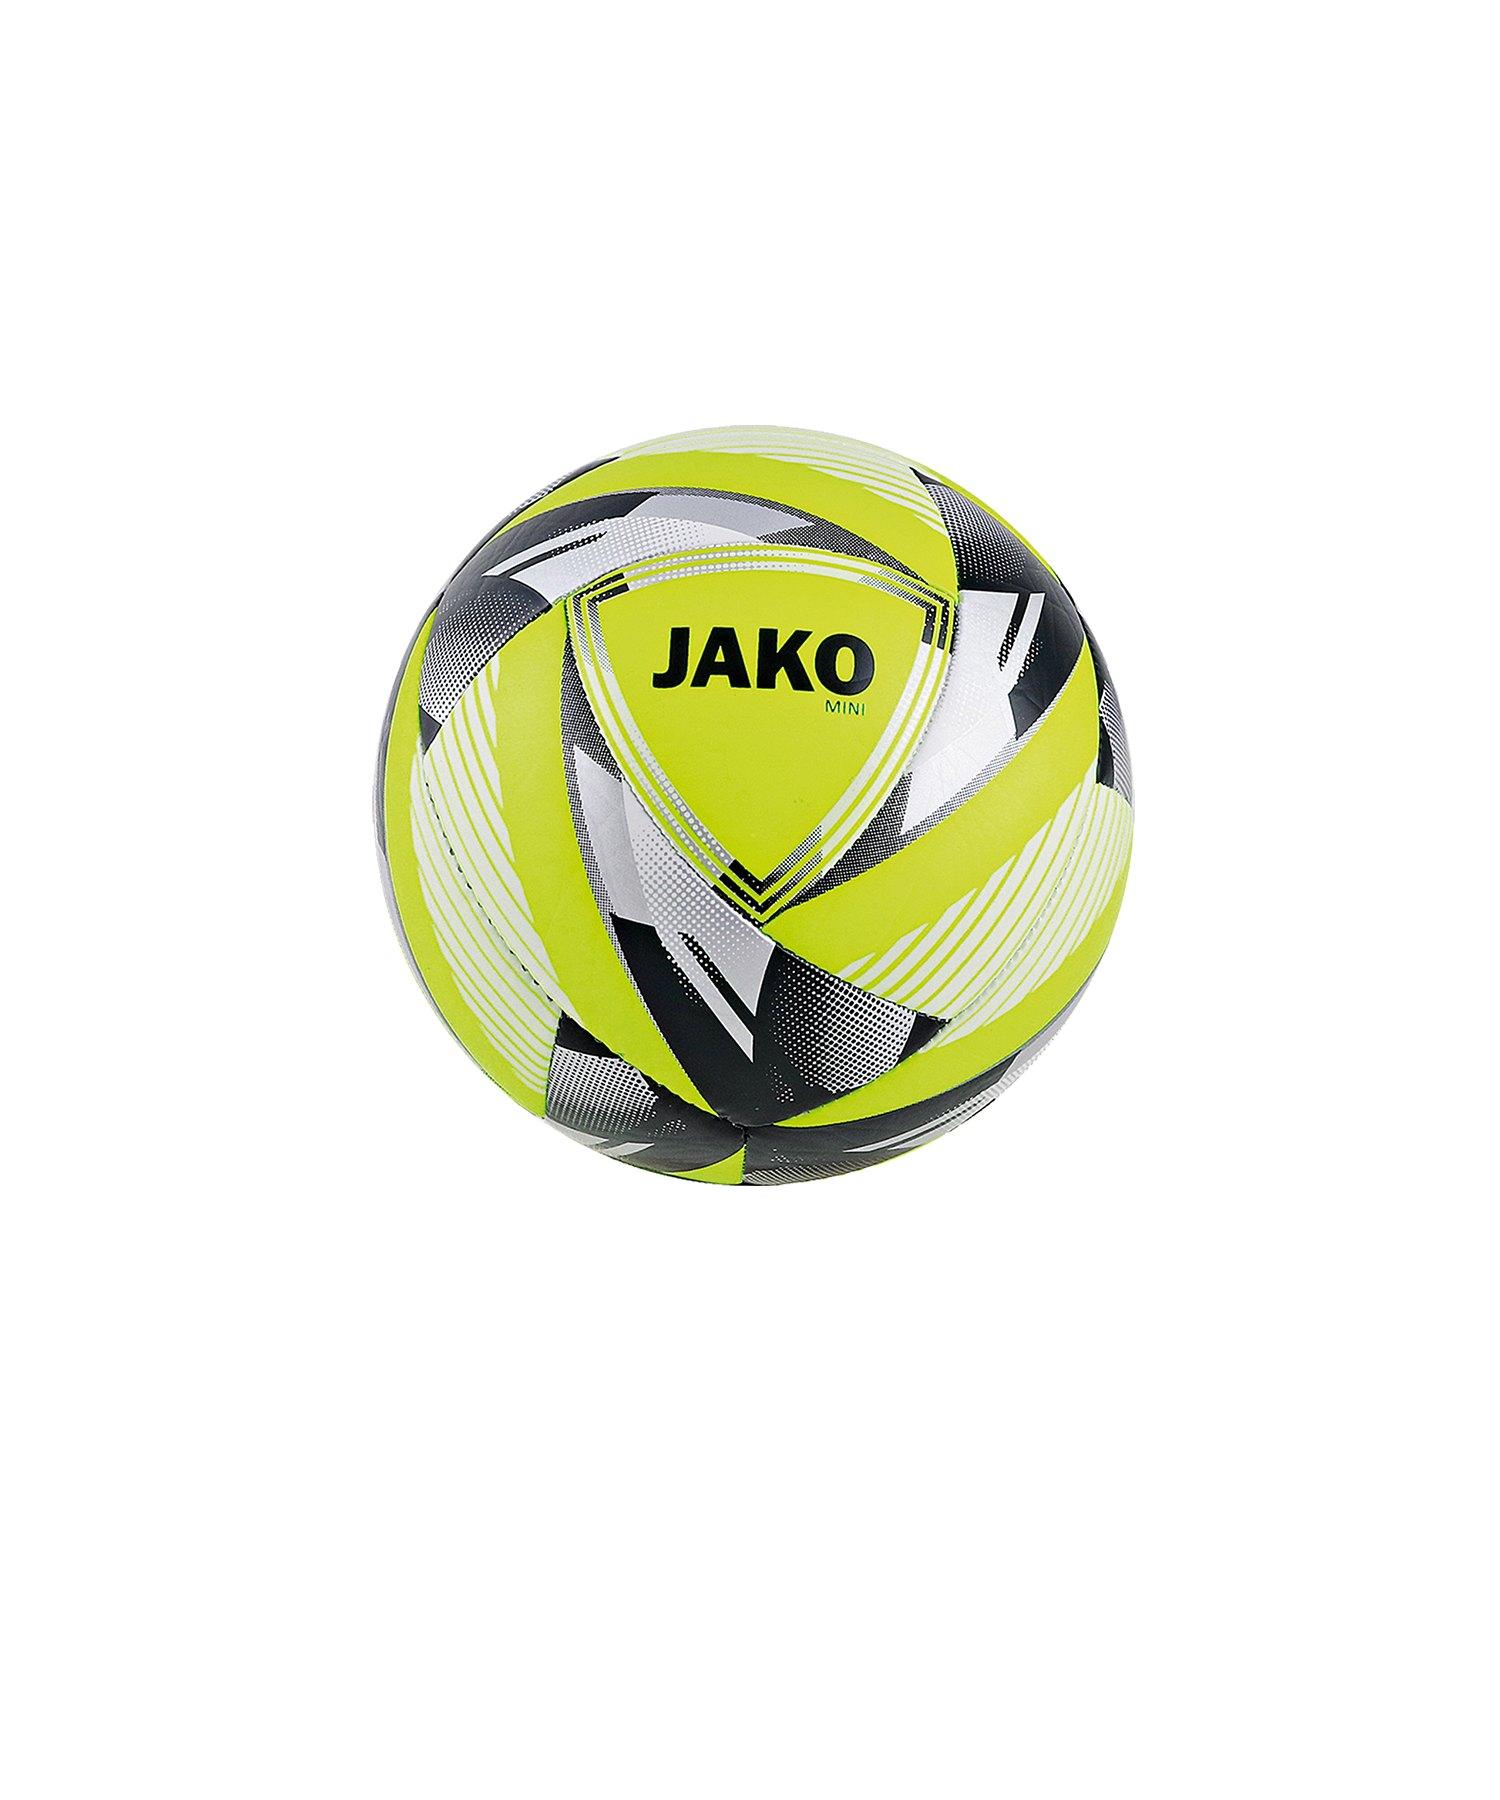 Jako Miniball Neon Gelb Silber F03 - Gelb